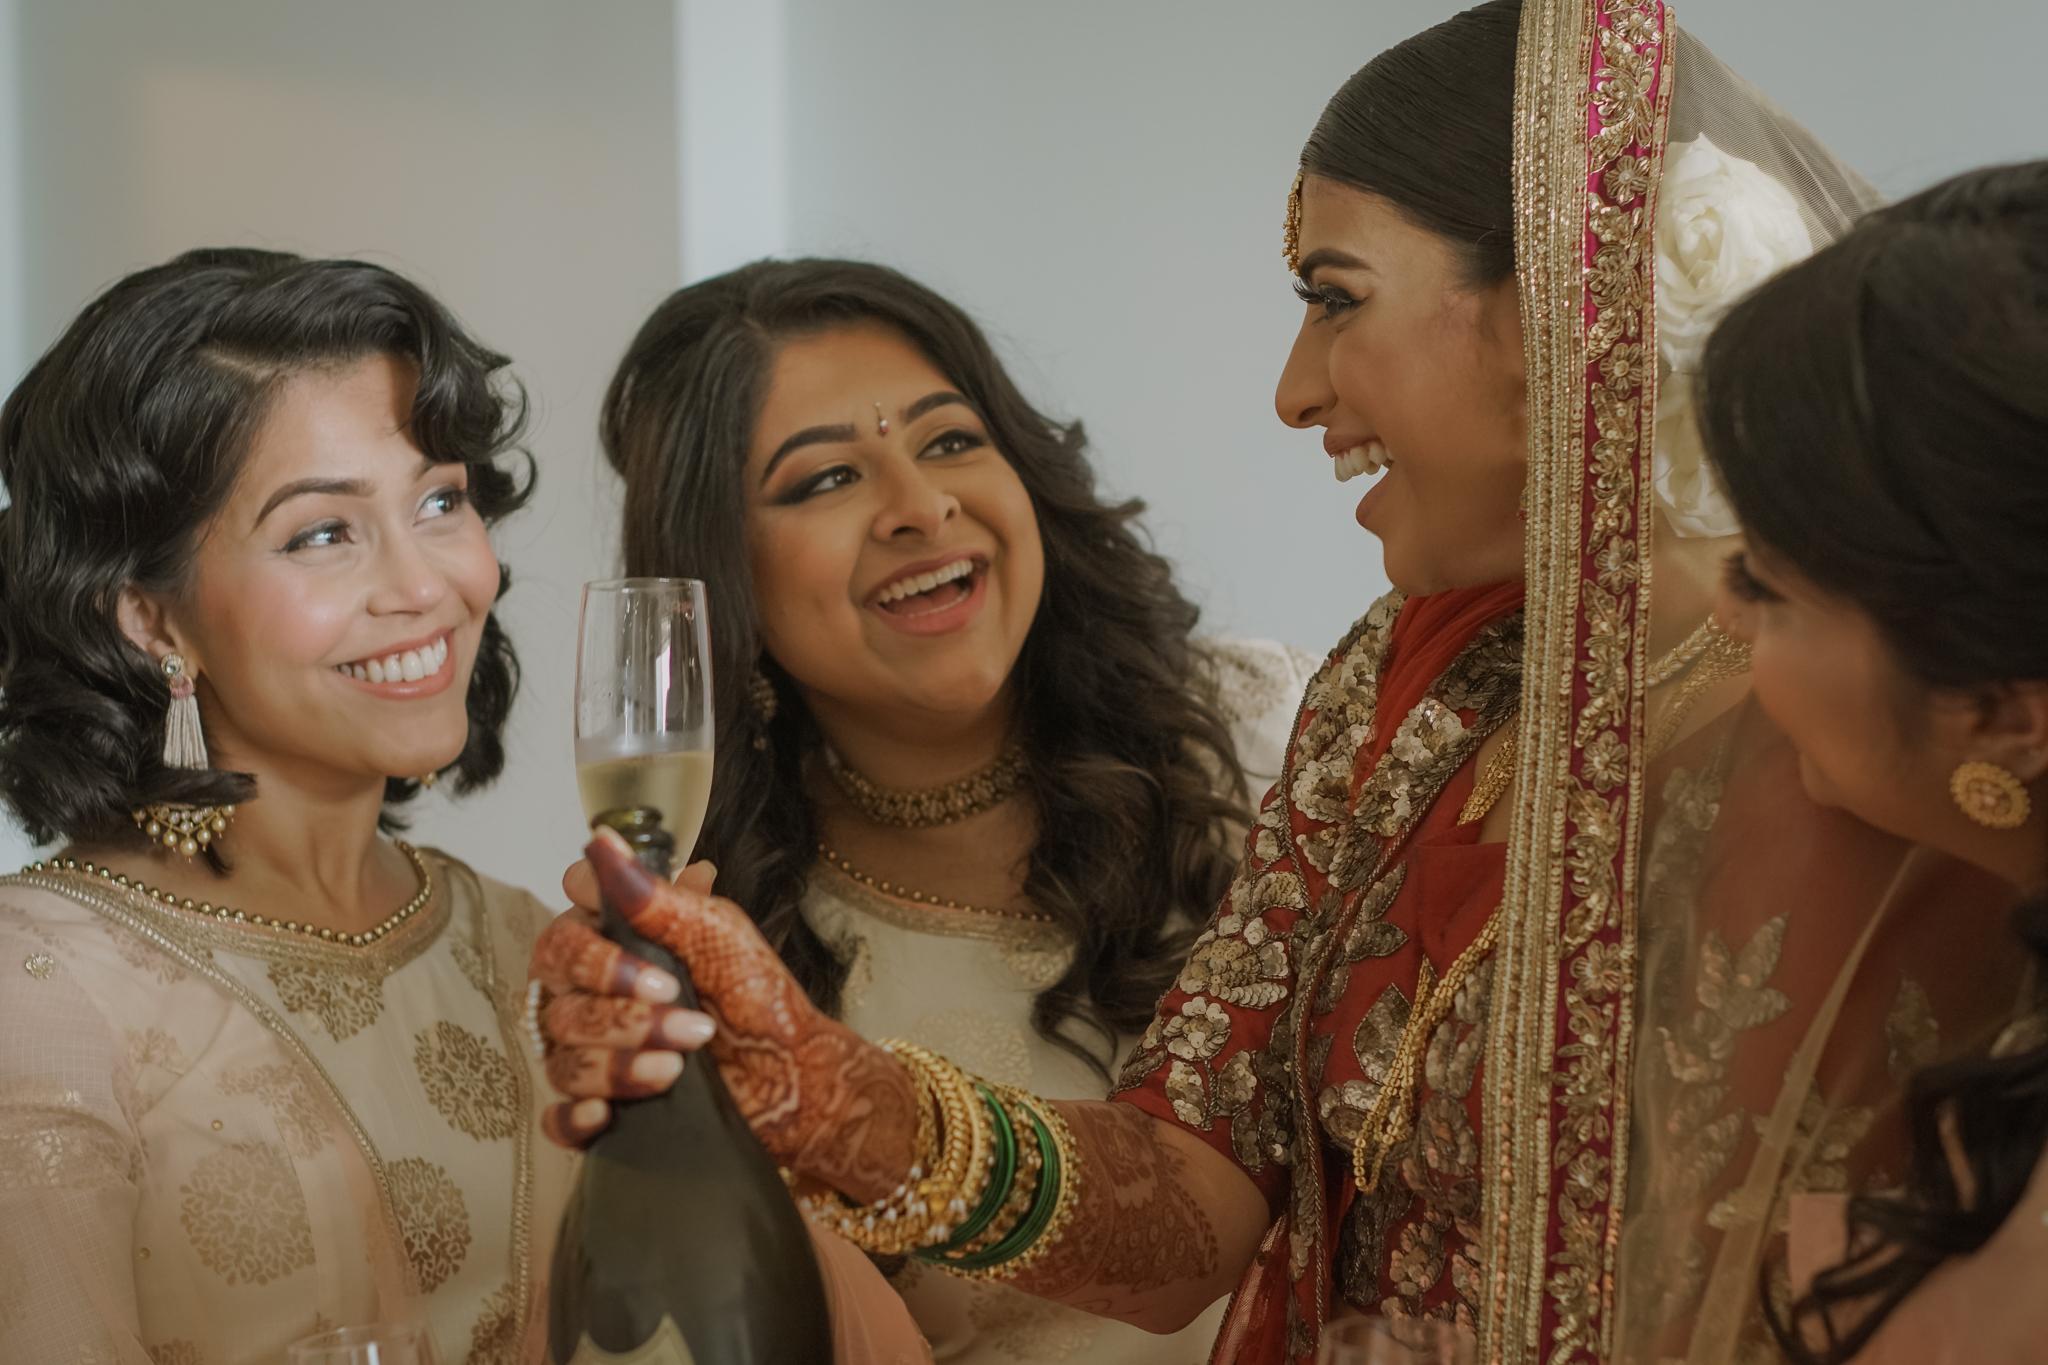 RITZ-CARLTON SOUTH ASIAN WEDDING